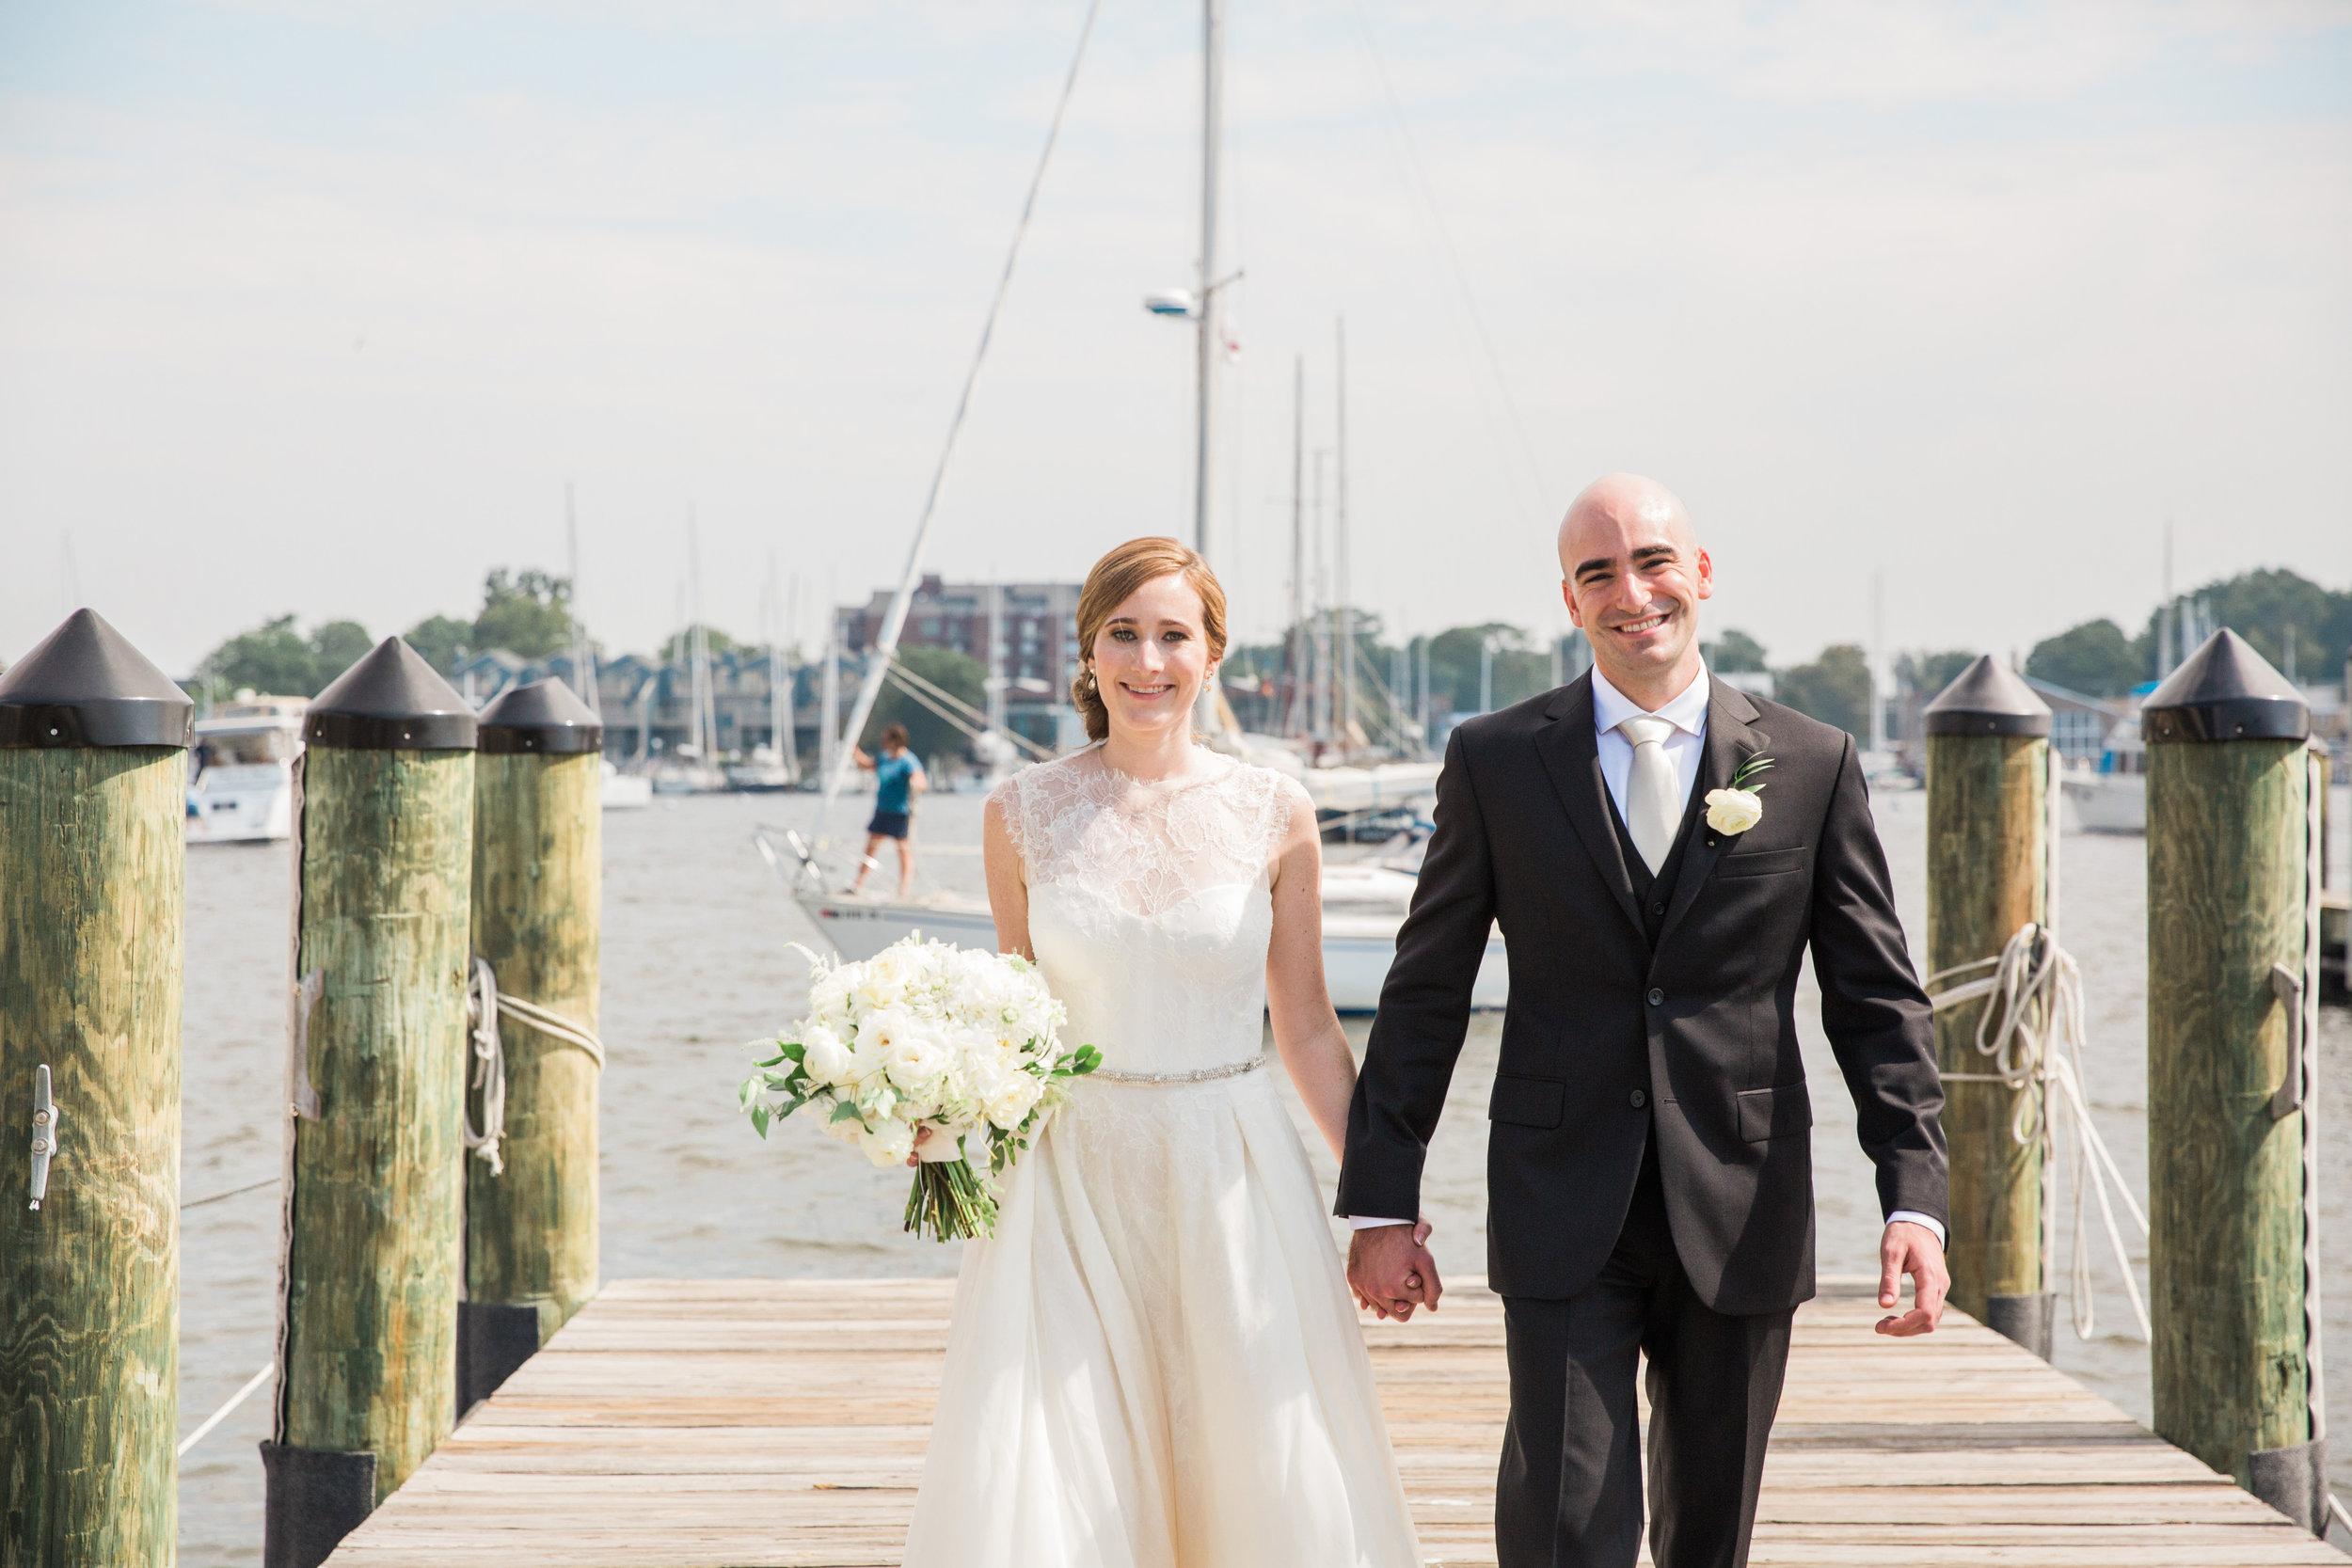 143-Annapolis-Maryland-Wedding-MA17.jpg